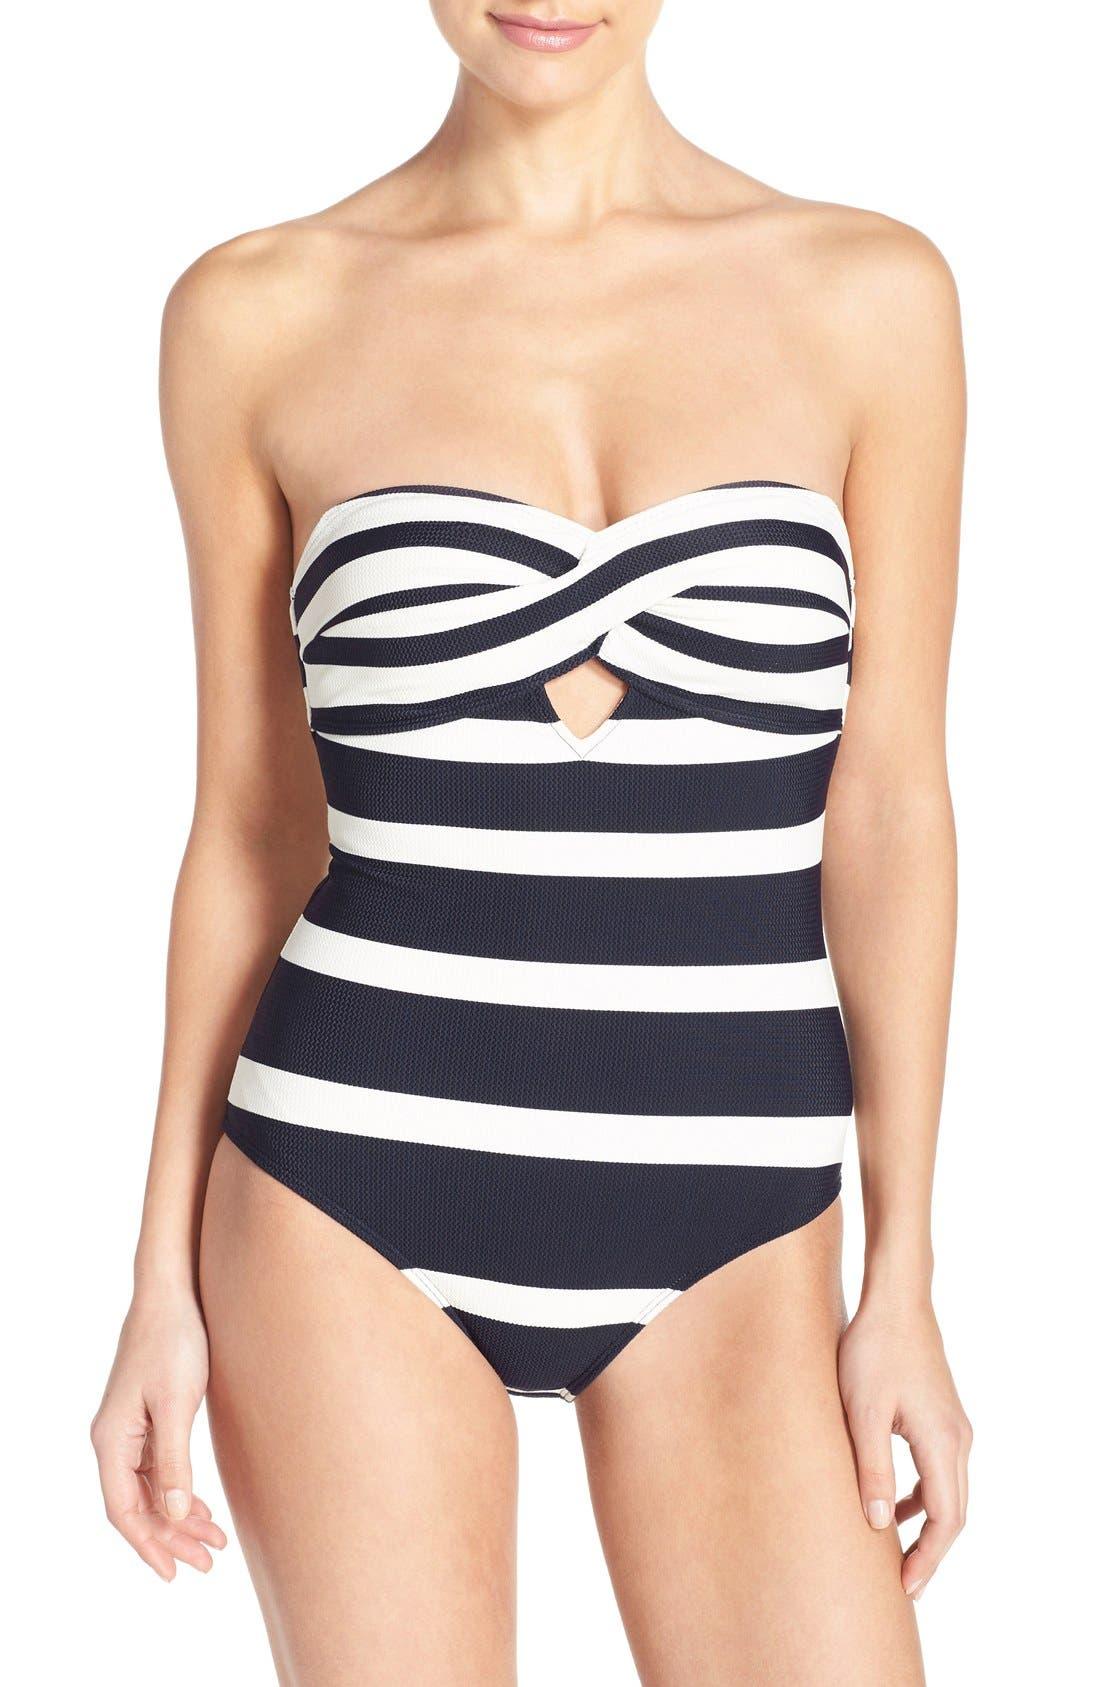 'Cirana' Textured Bandeau One-Piece Swimsuit,                             Main thumbnail 1, color,